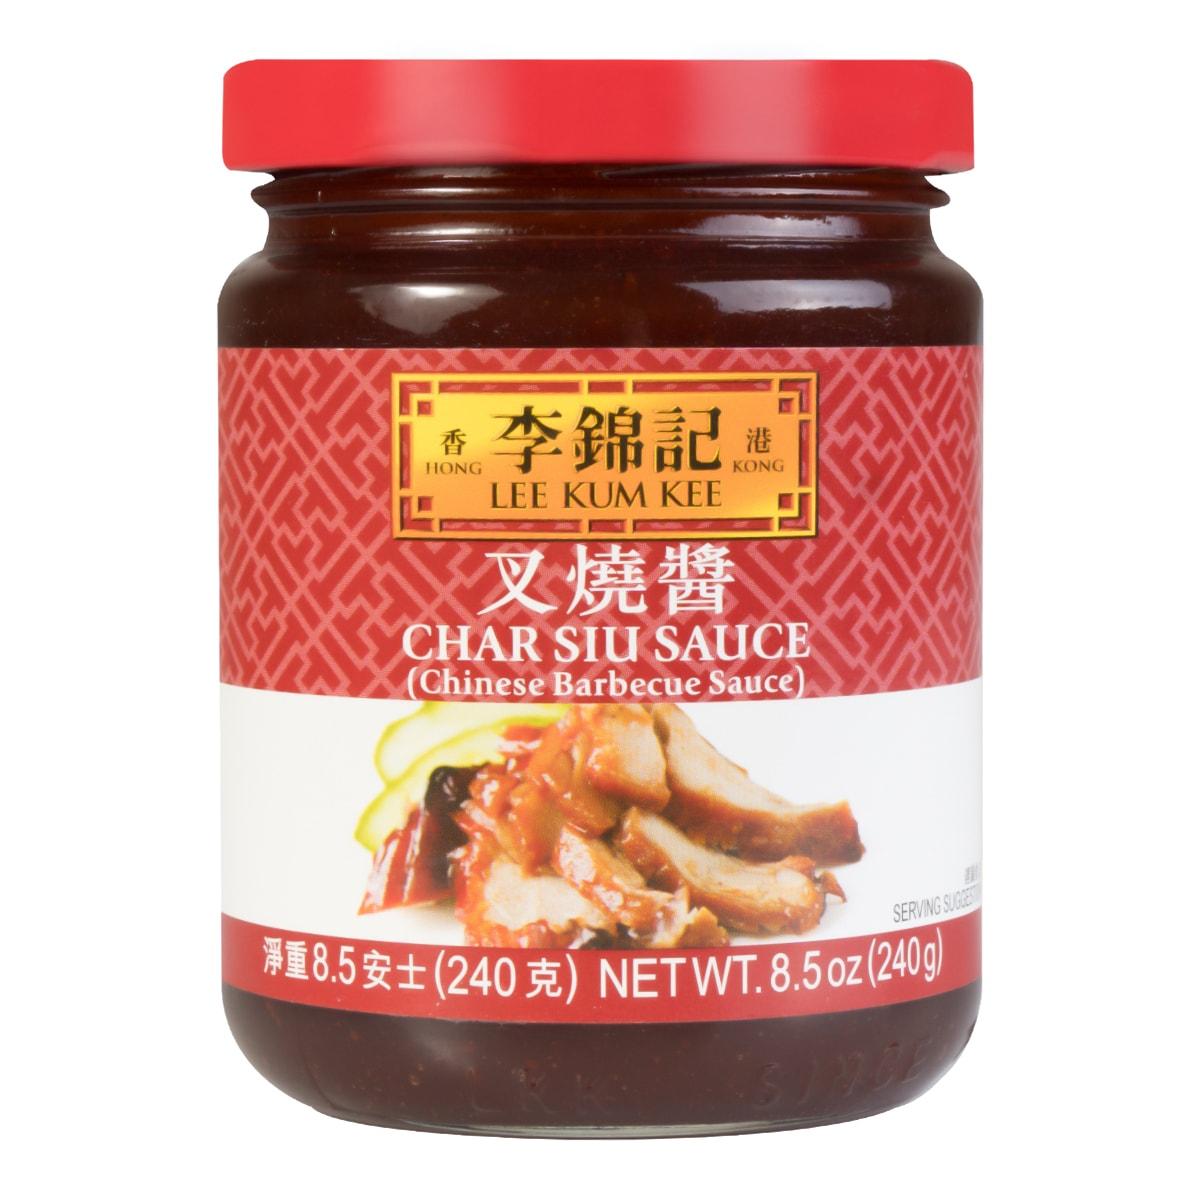 LEE KUM KEE Char Siu Sauce 230g